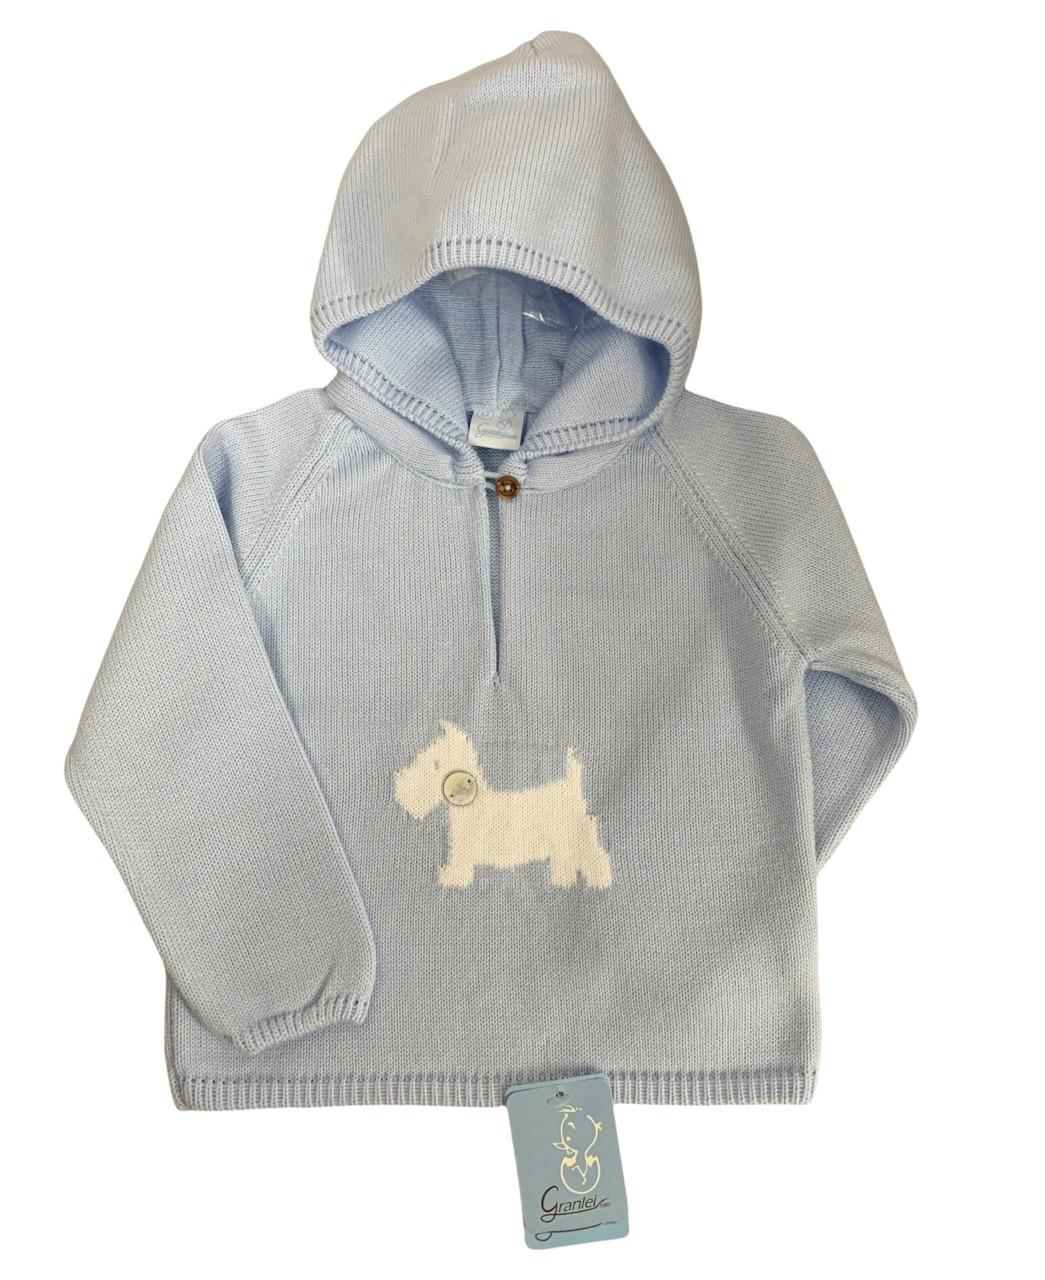 Artesania Granlei Granlei Boys Hooded Knit Jumper - 2290 AW21